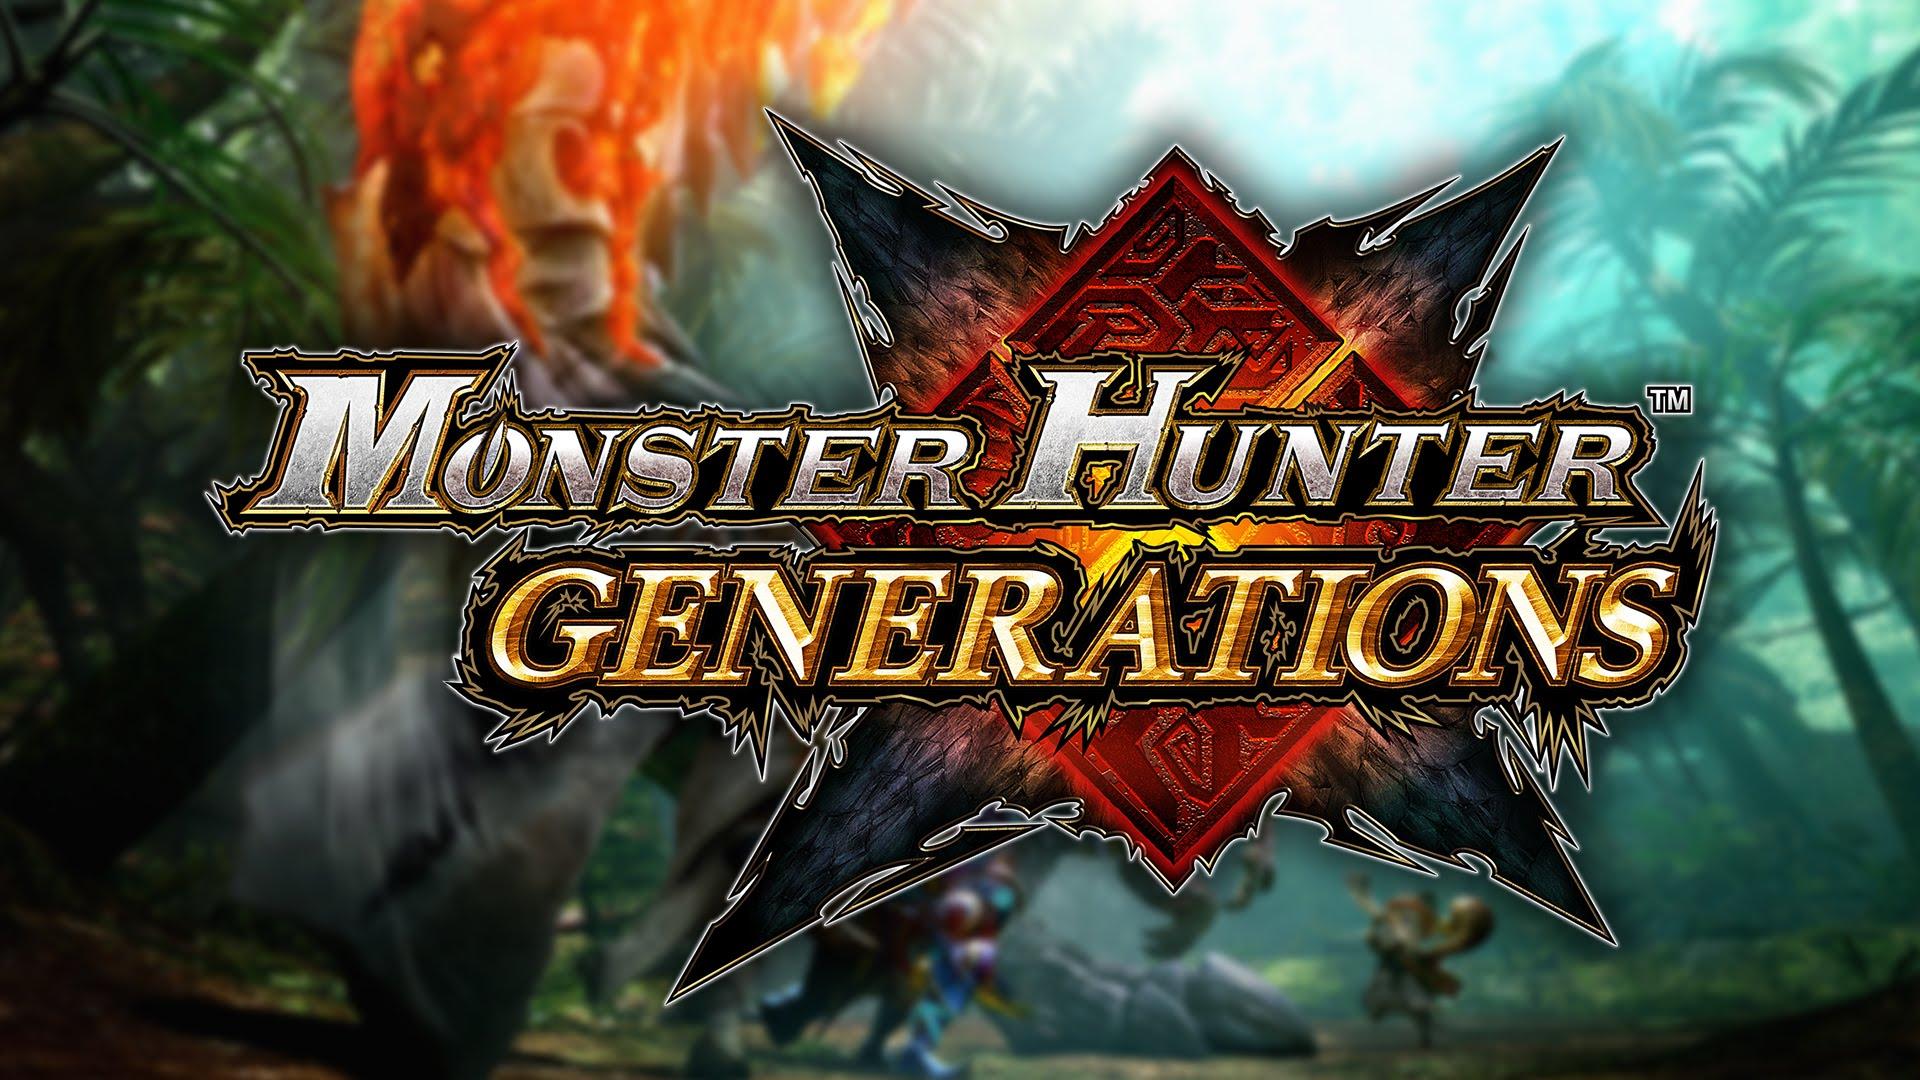 Monster-Hunter-Generation-Gamesoul